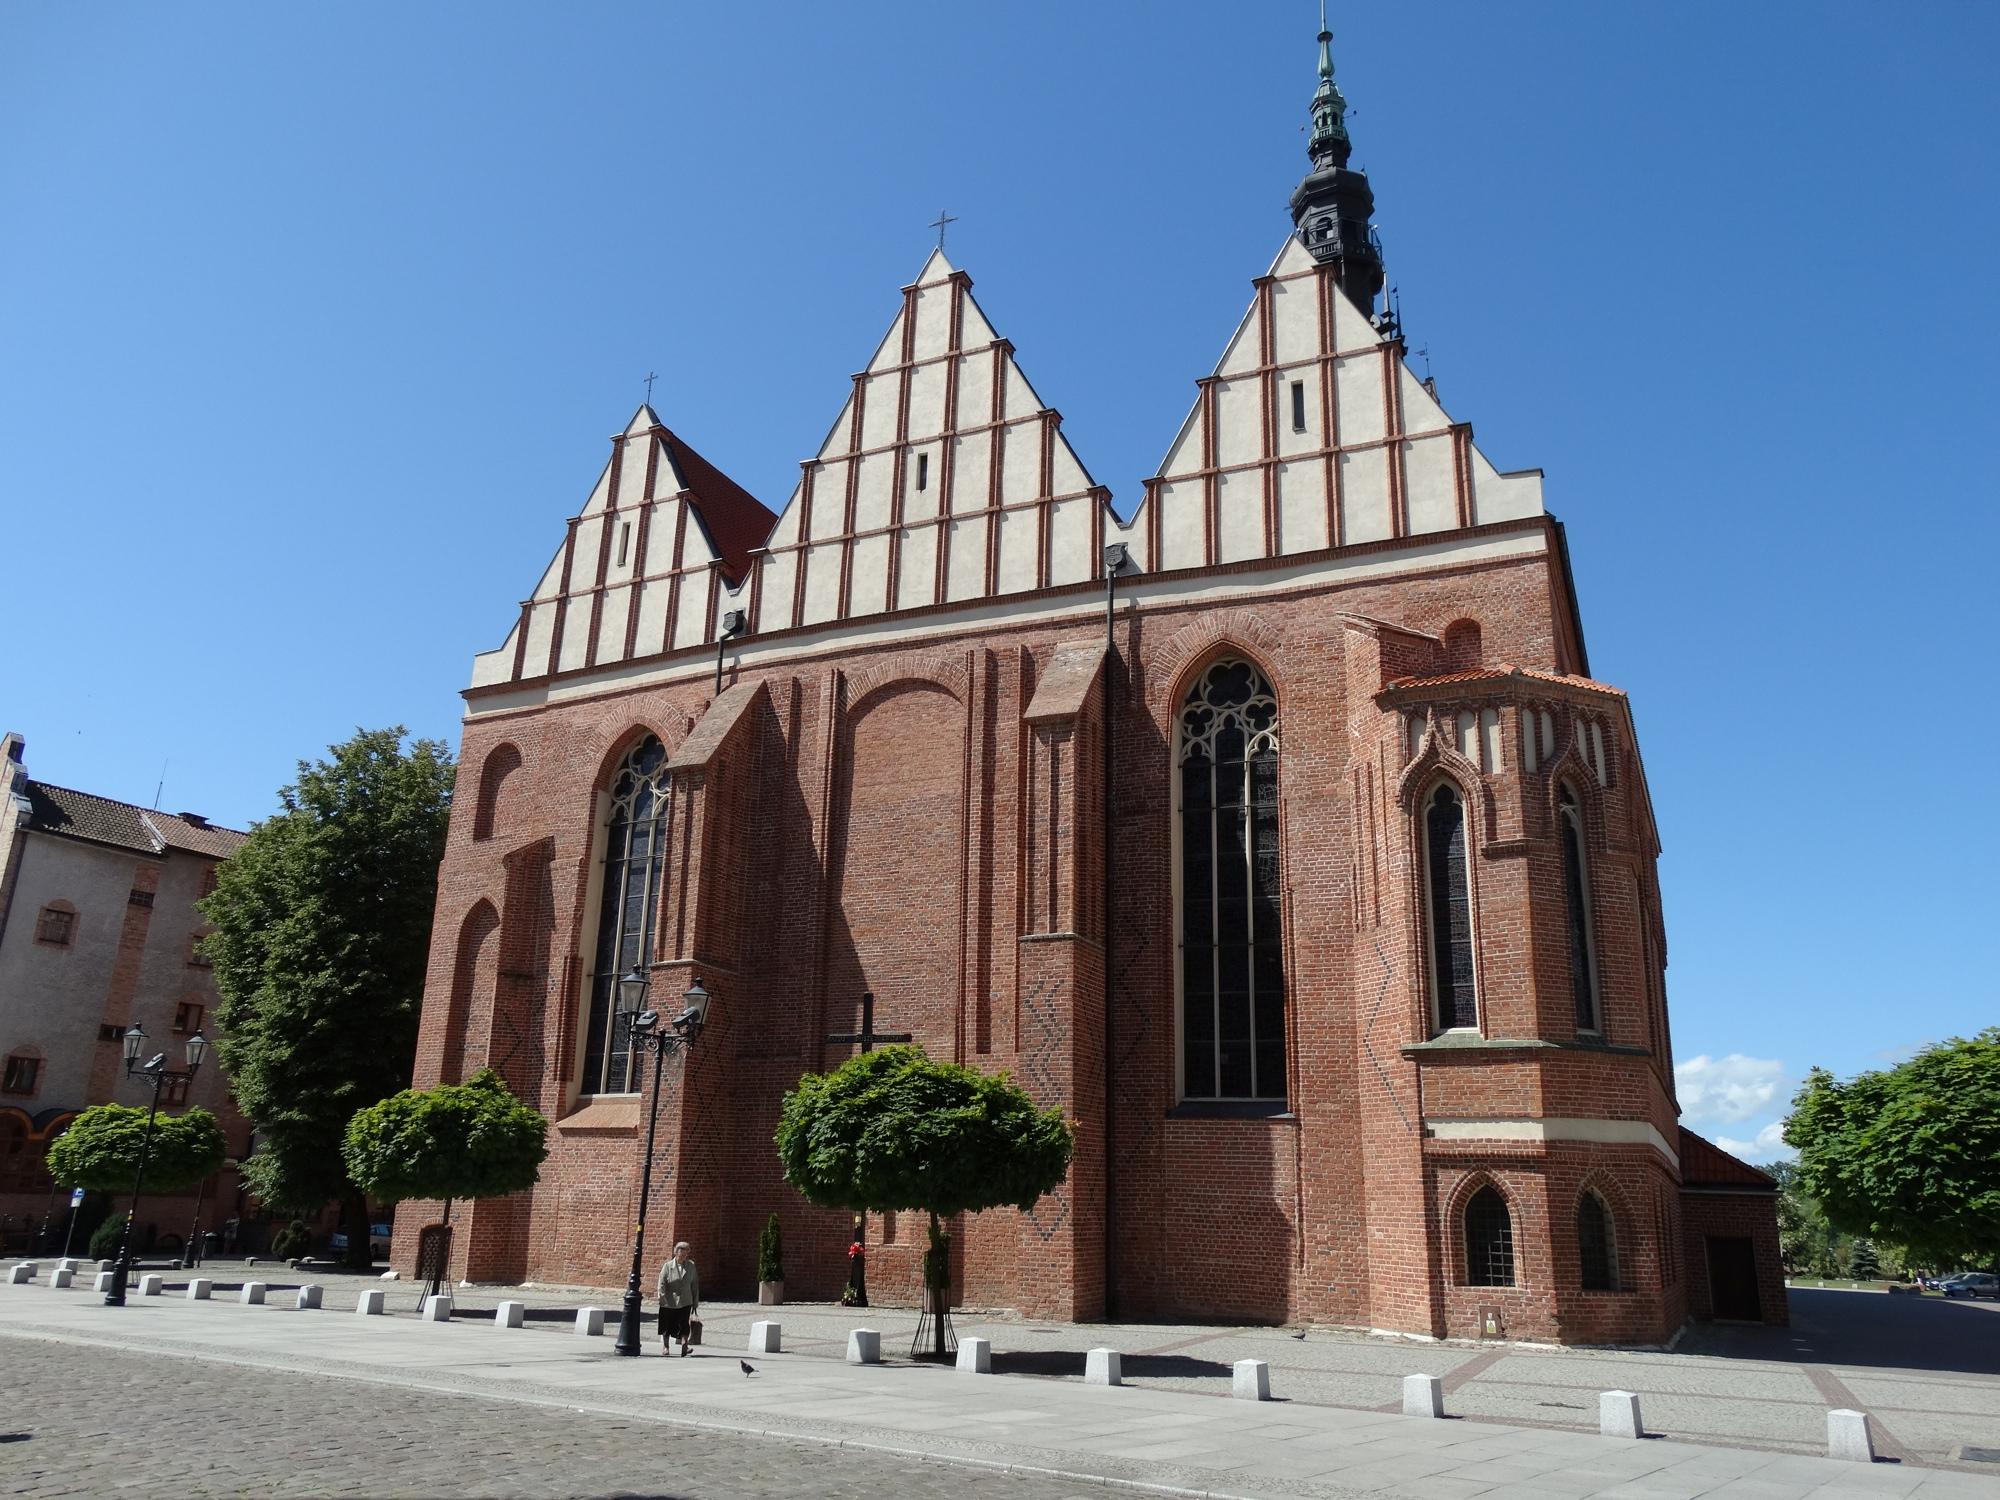 http://m.wm.pl/2016/01/orig/katedra-widok-od-frontu-286213.jpg